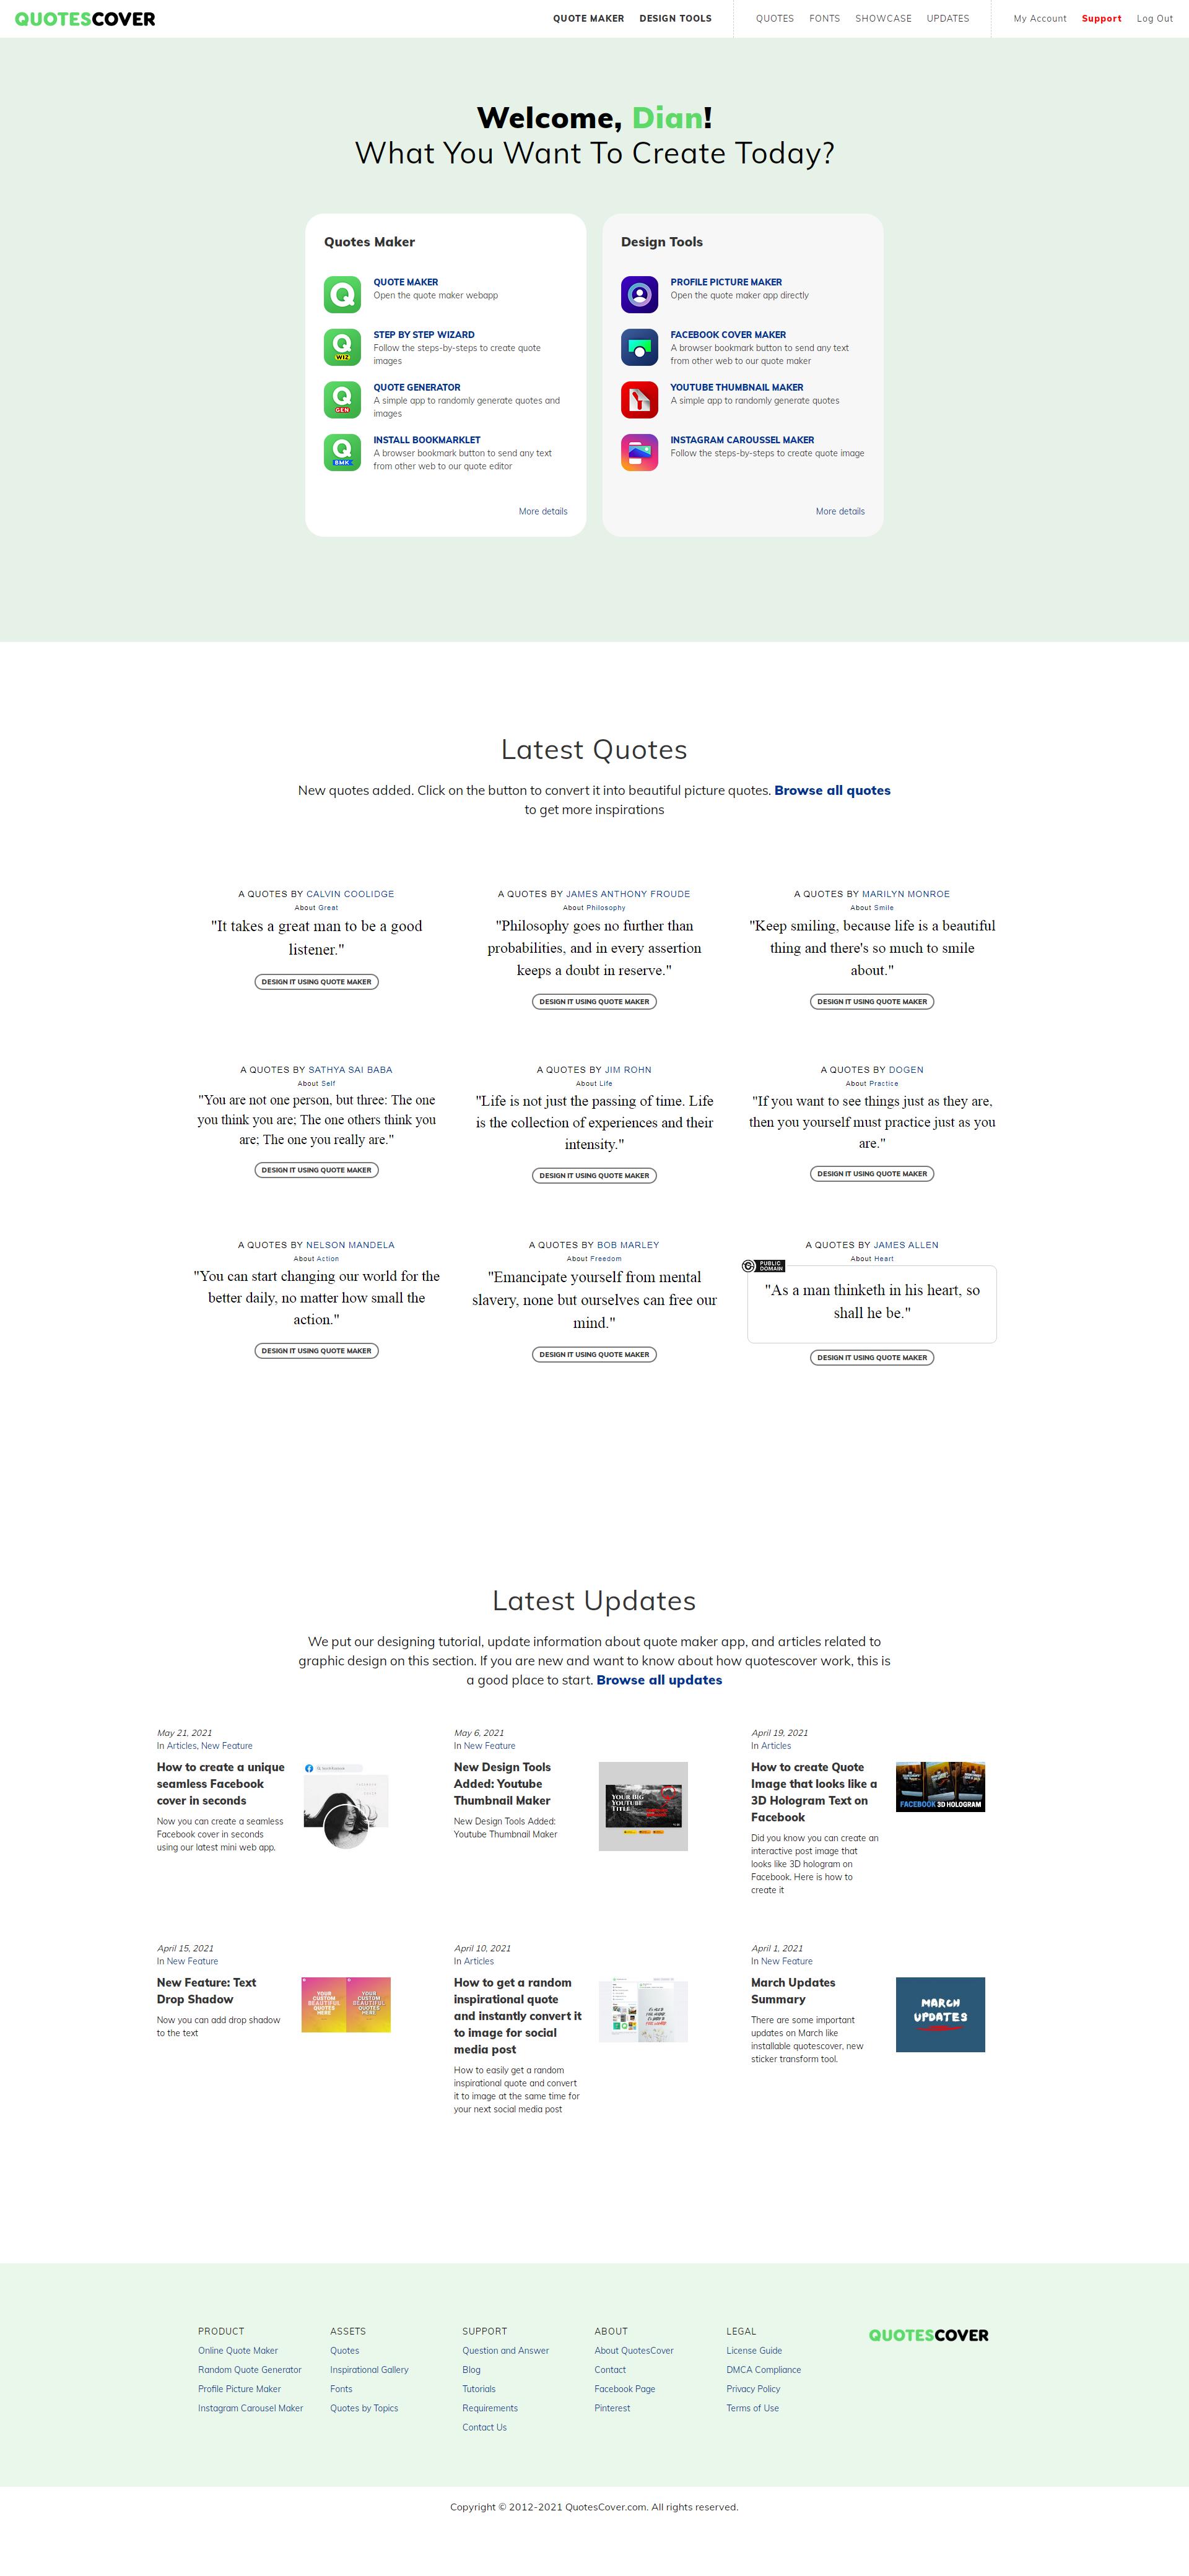 Members Page Screenshot: The Homepage